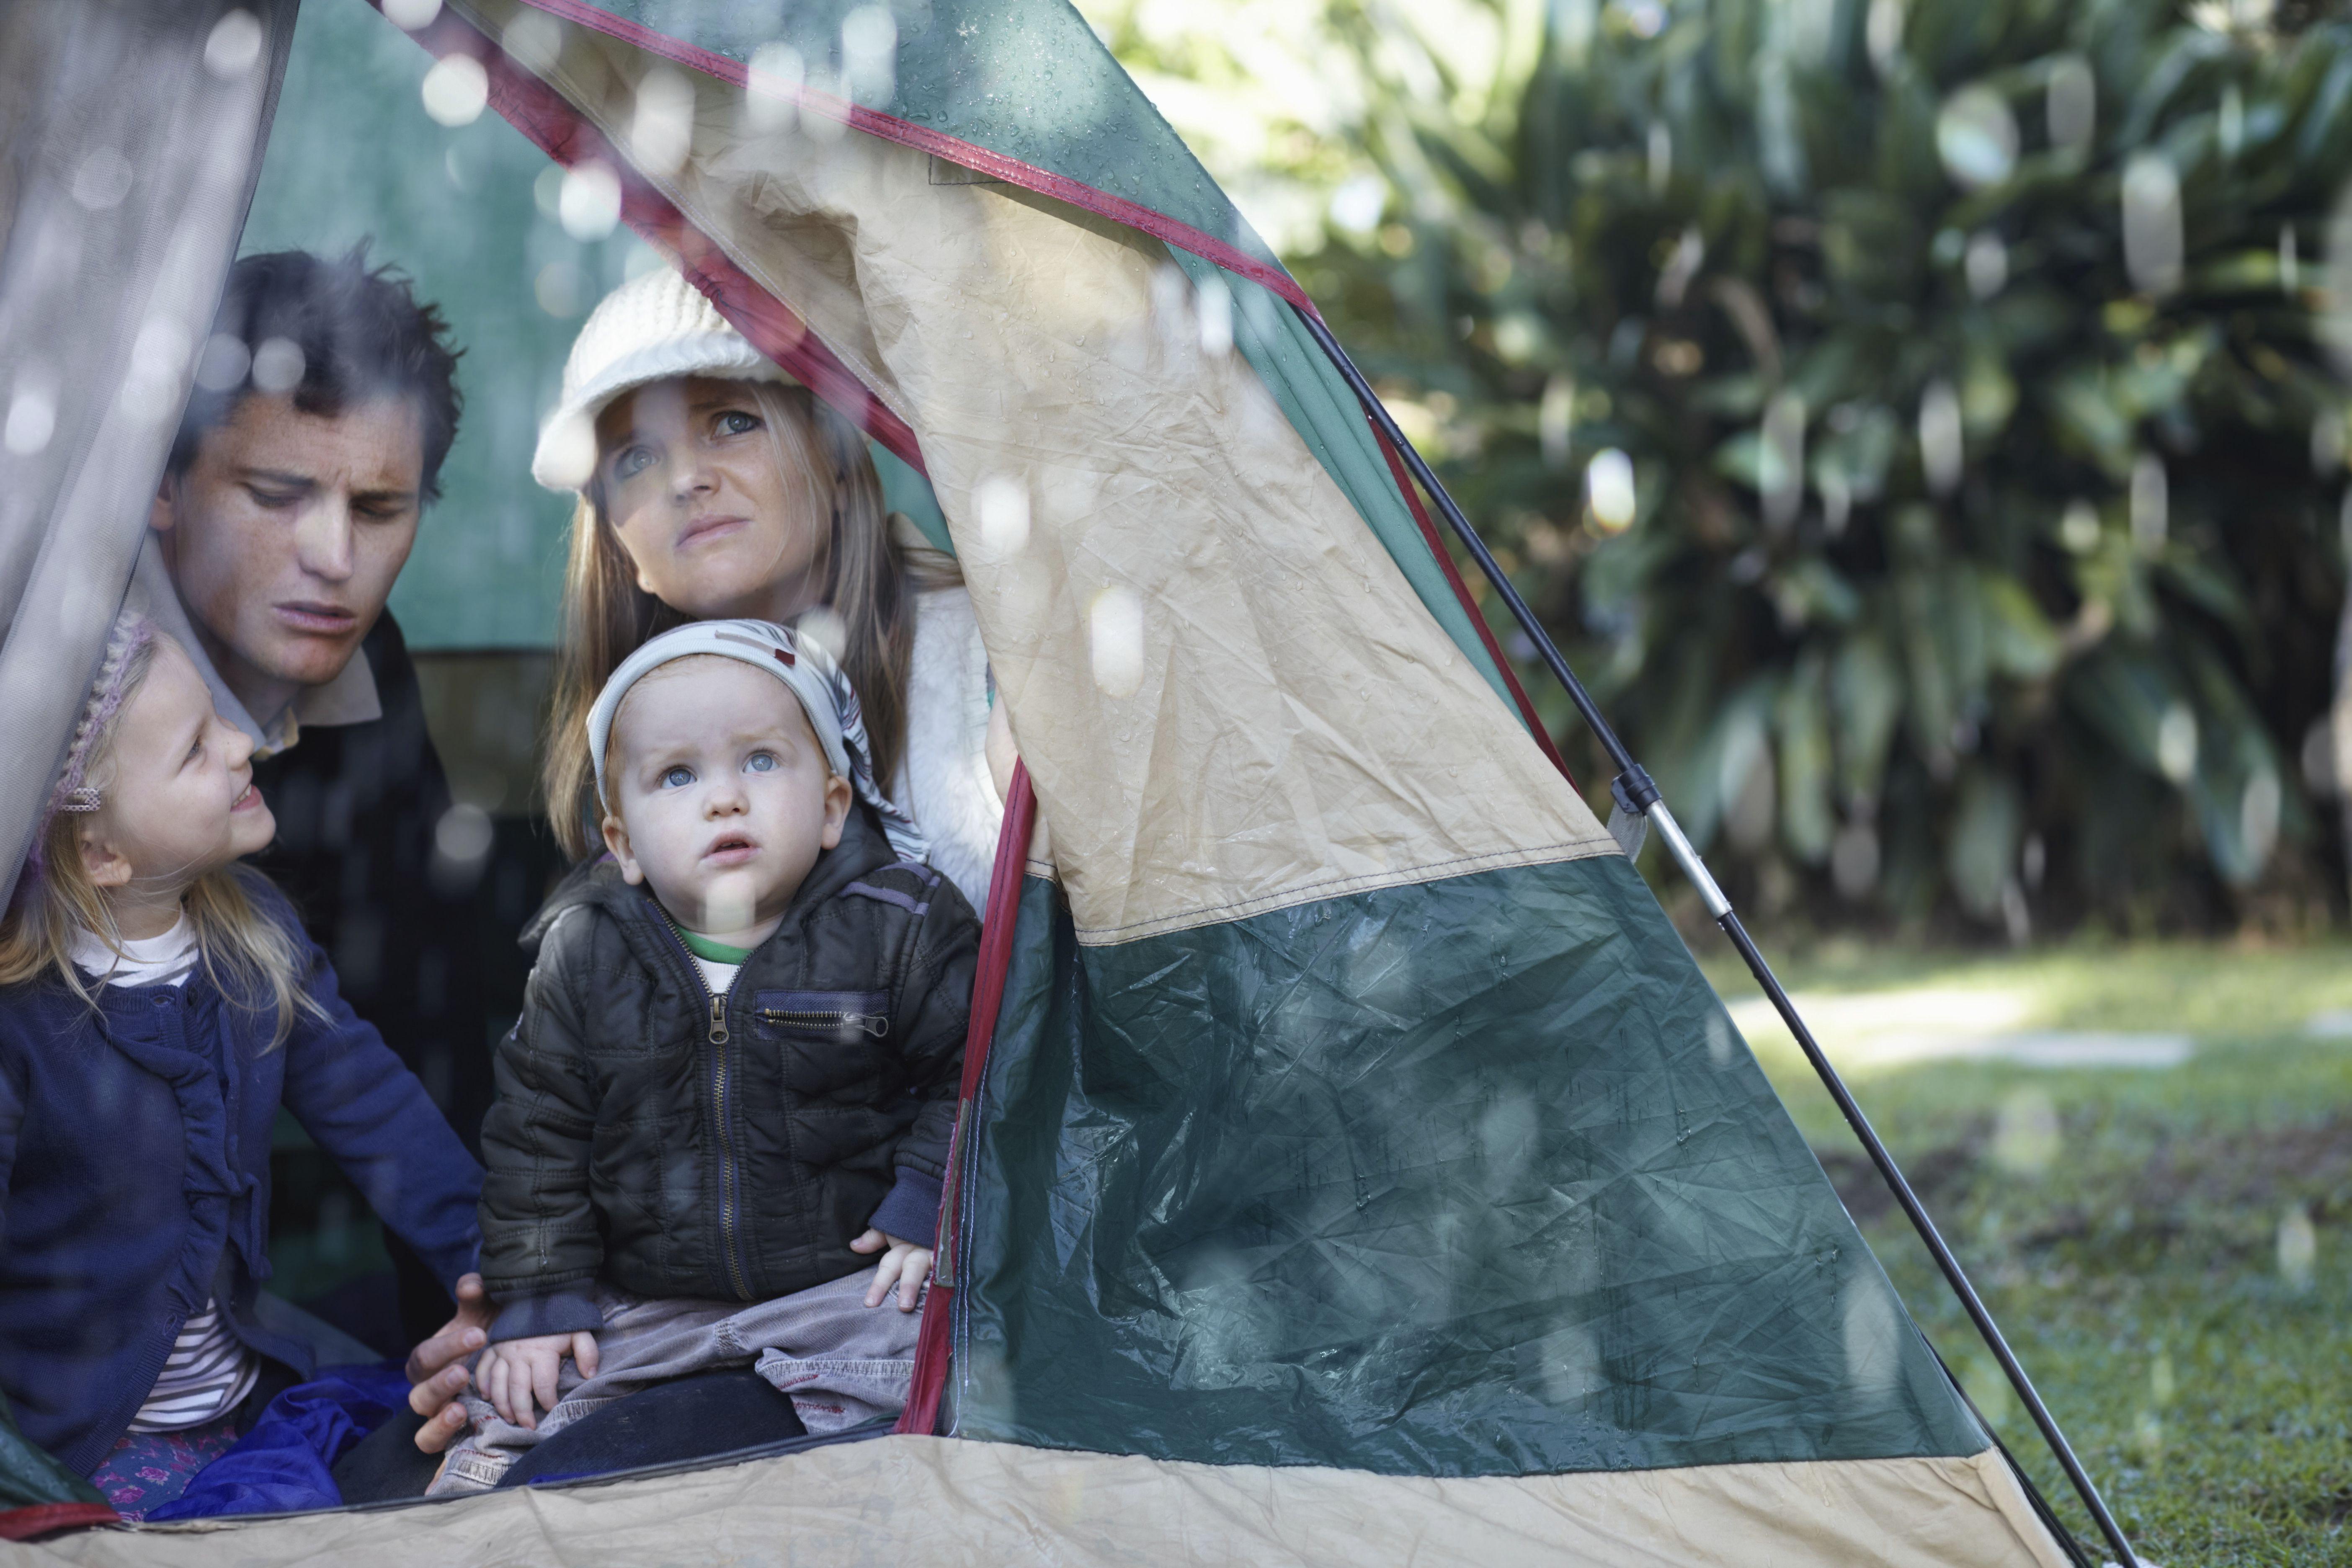 6 Cara Set Up Campsite a Seperti Pro